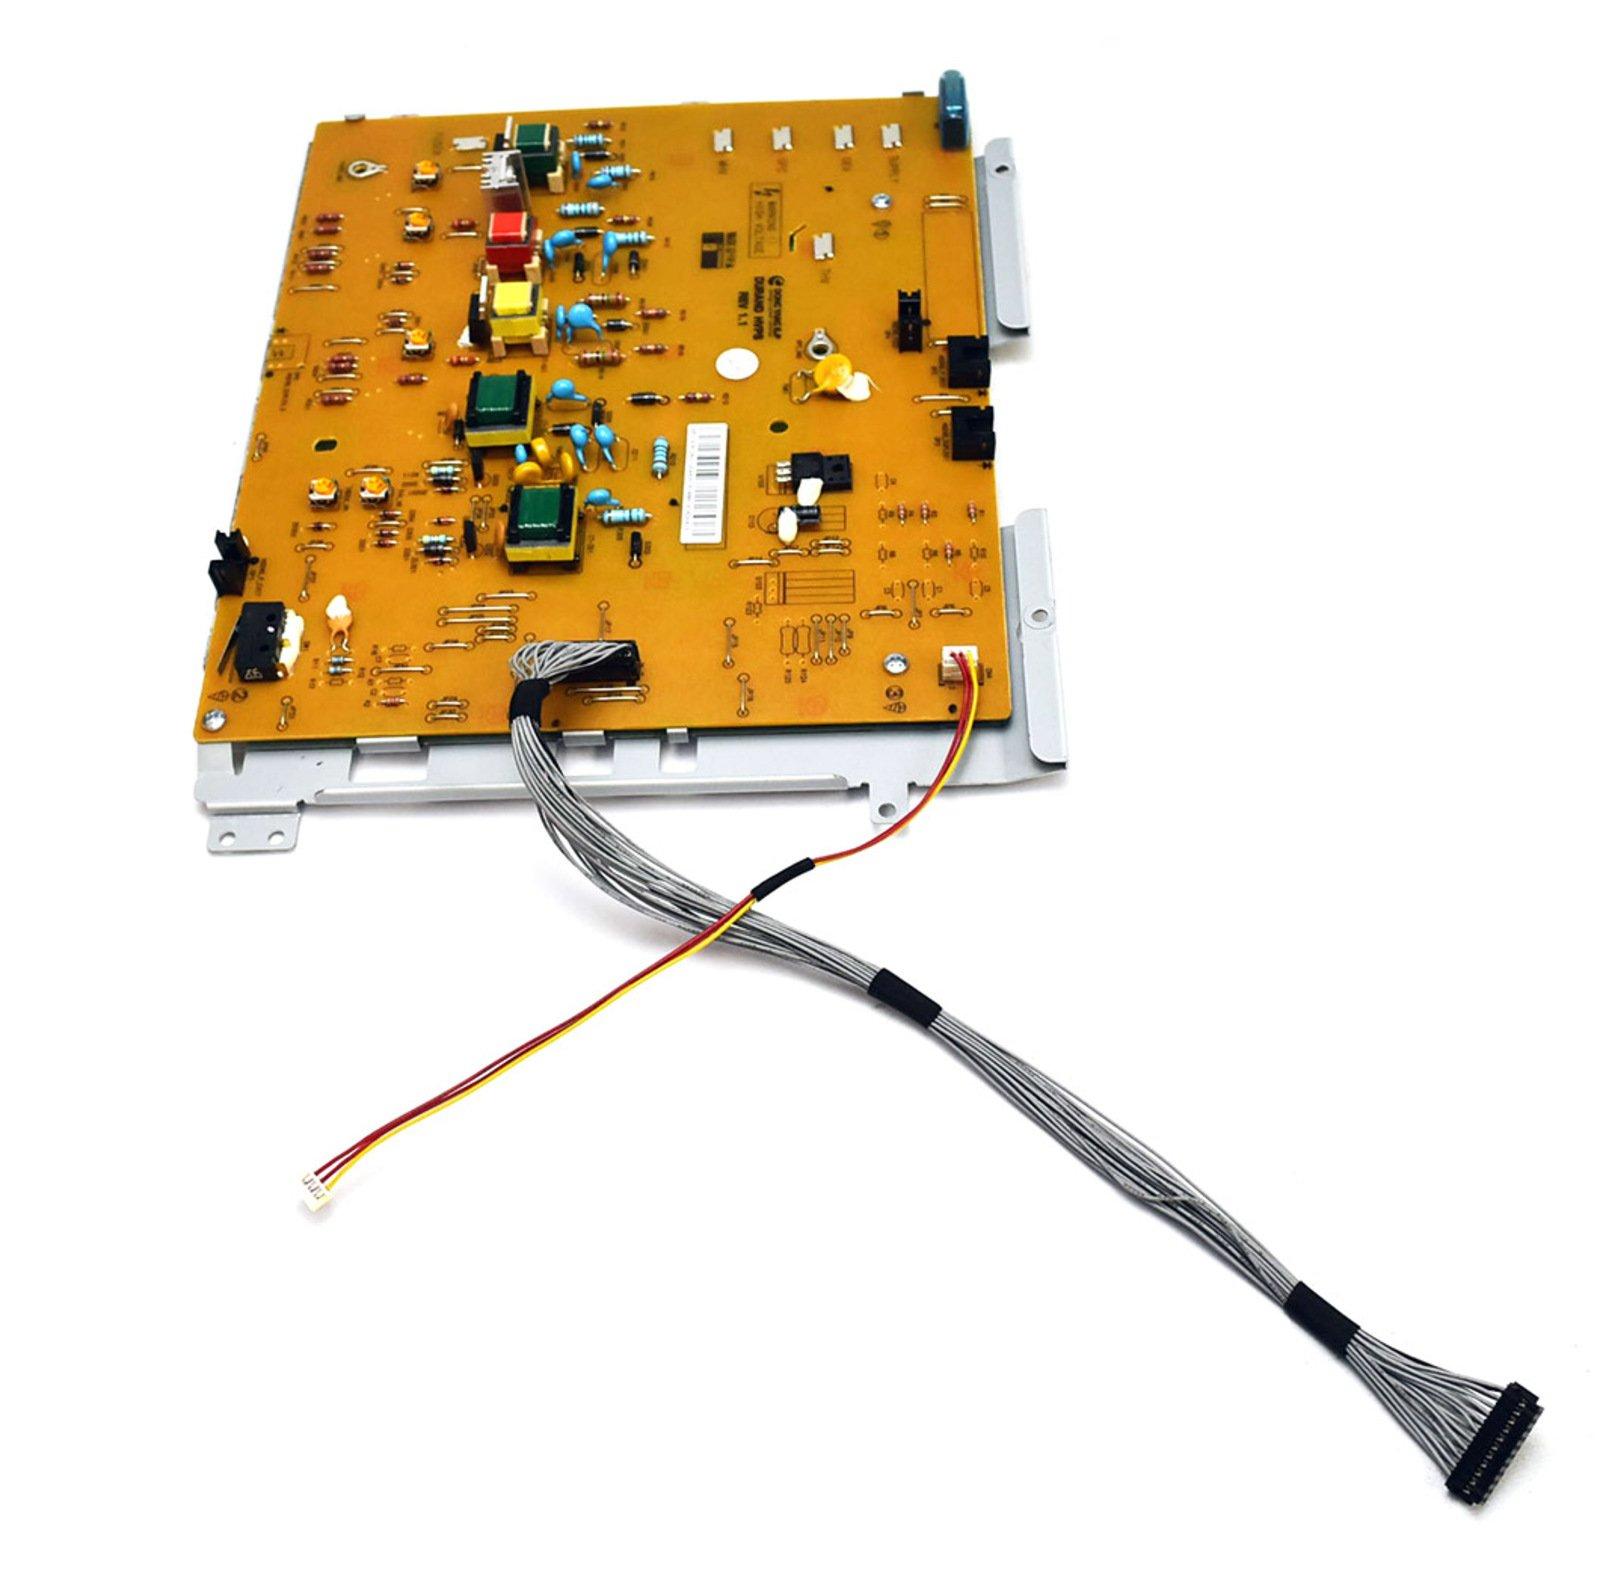 FOR DELL F028C Genuine OEM Dell 2335dn 2335 Laser Printer HVPS High Voltage Power Supply Printer PCBA w/Backplate Panel Base Assembly